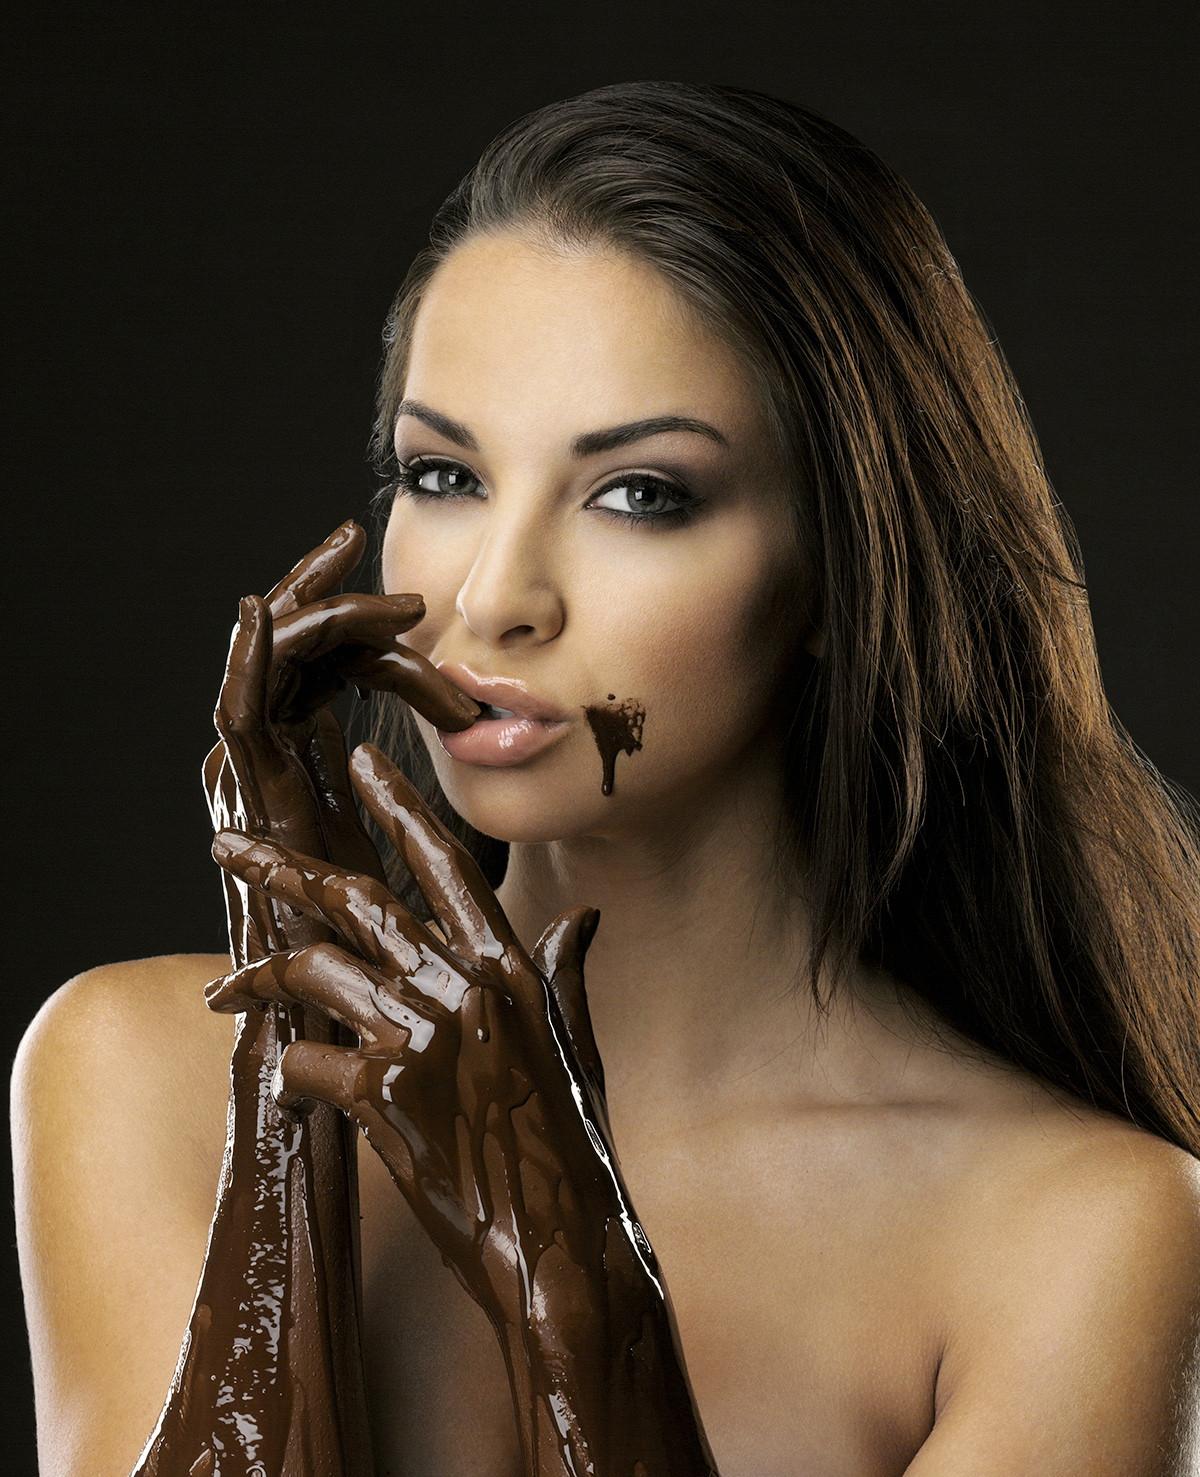 Hot chocolate girl, girls refrigerator in panties